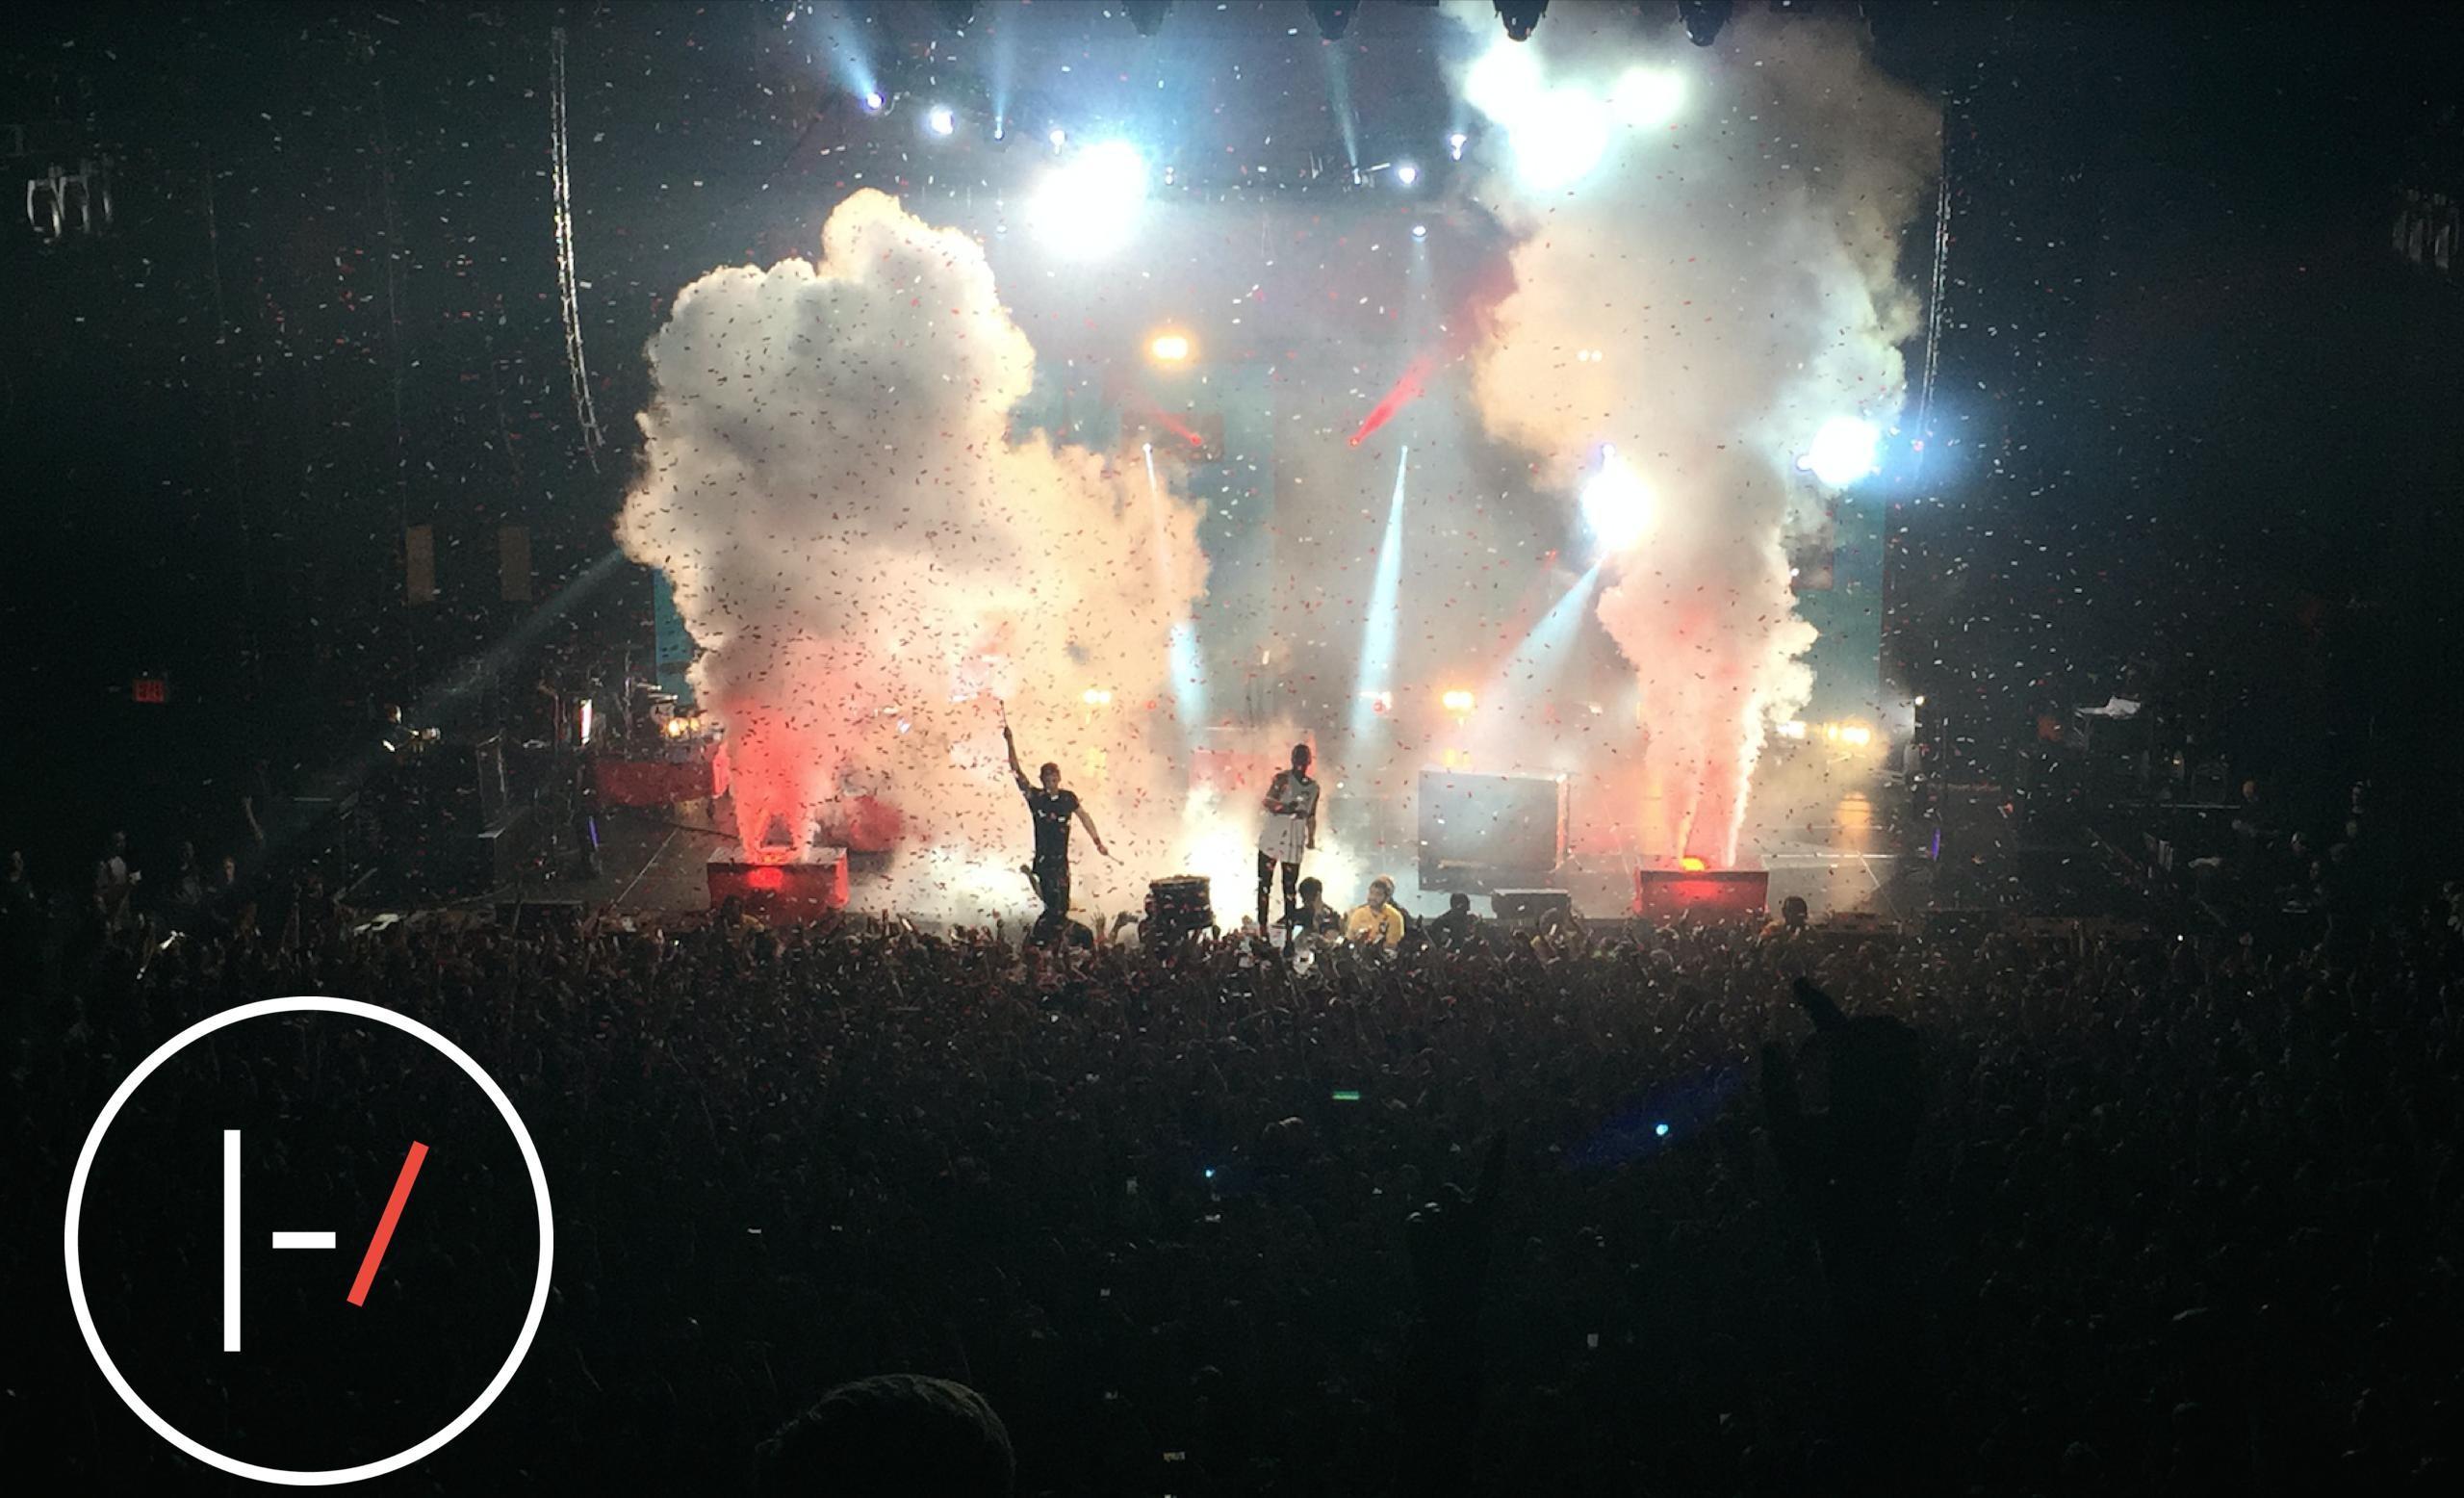 Fall Out Boy Wallpapers Iphone Twenty One Pilots Desktop Wallpaper 183 ① Download Free